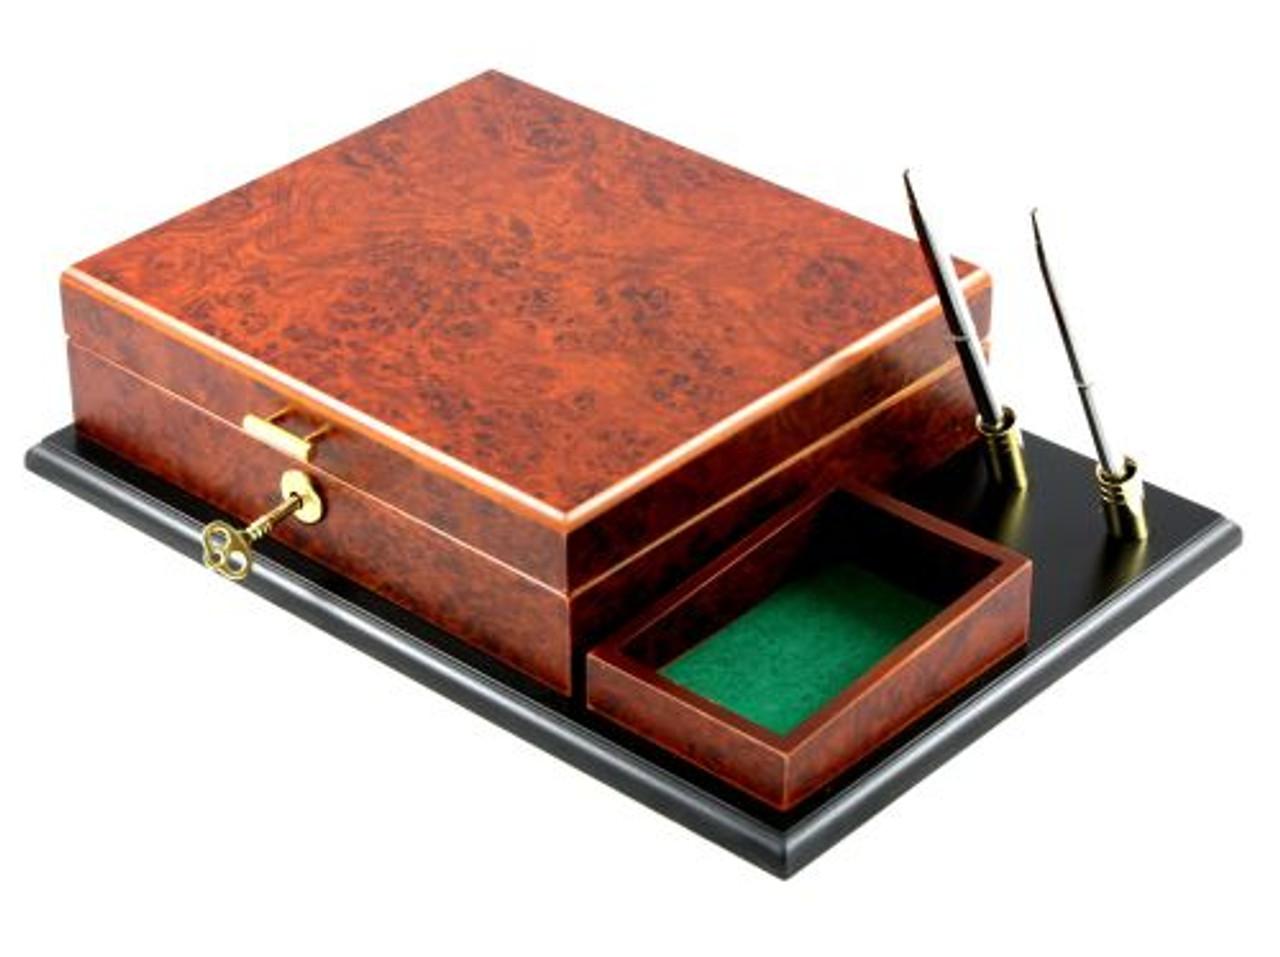 Executive Cigar Humidor Gift Set